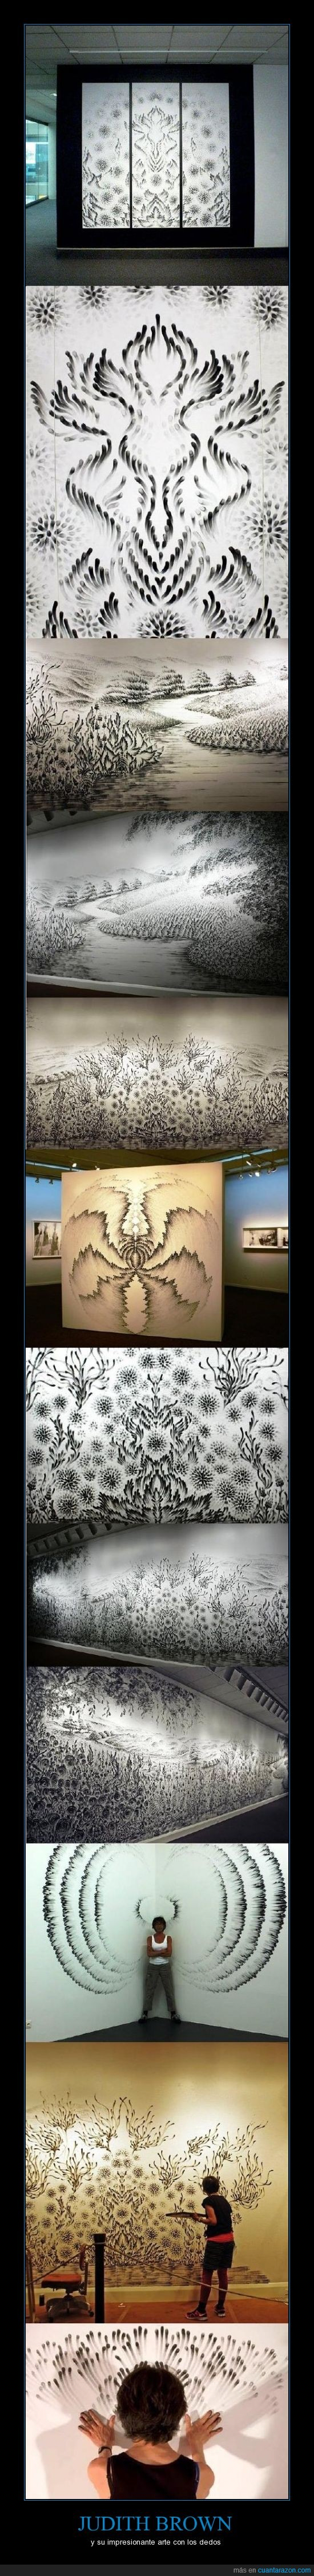 arte,dedos,increíble,Judith Brown,pintar